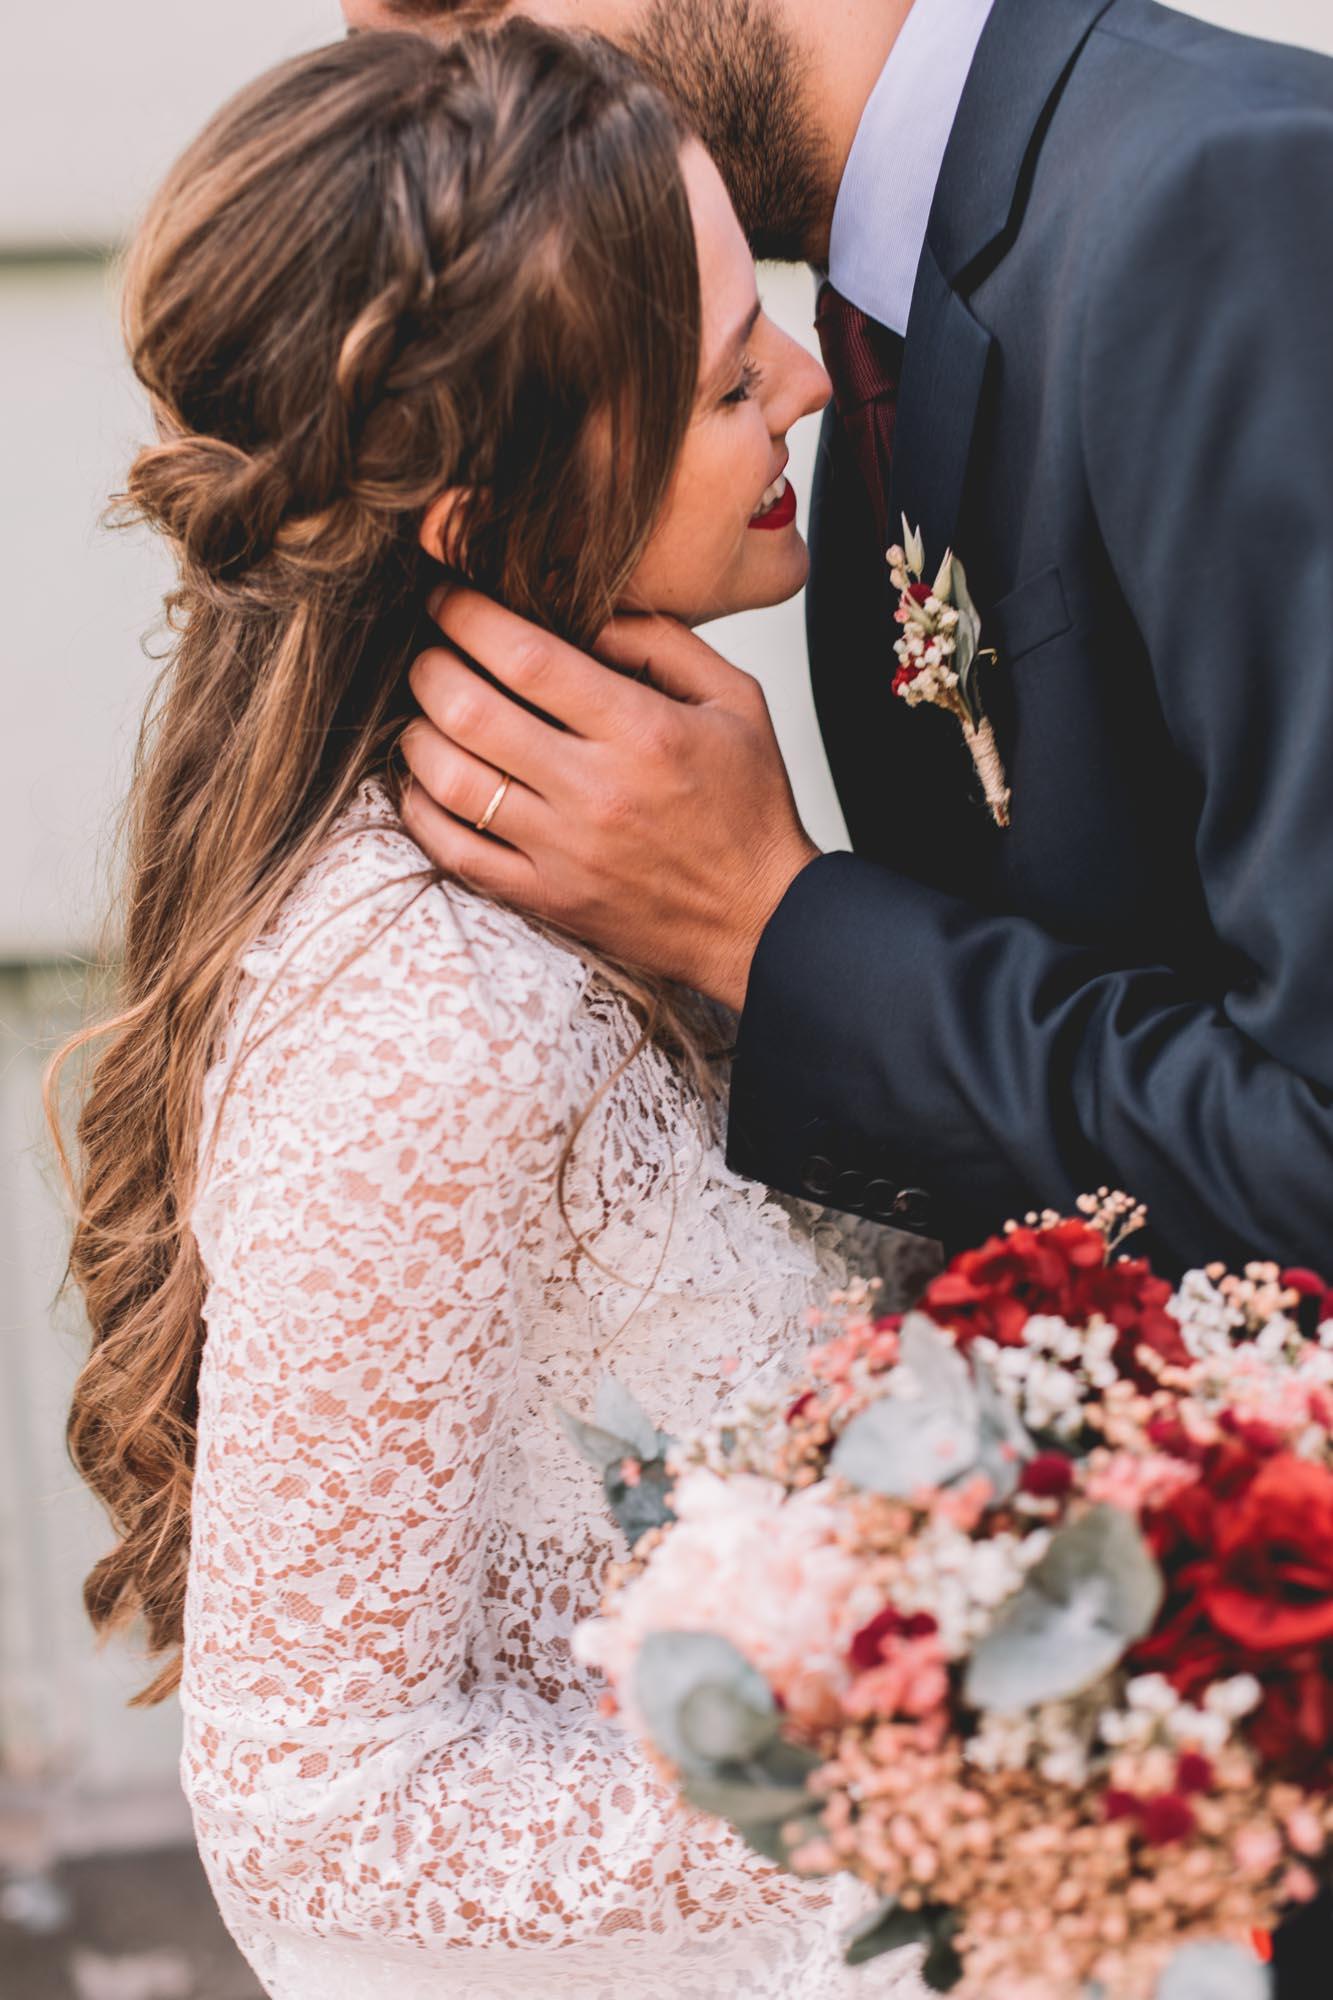 AXELLE + CHARLES_PARIS_PHOTOGRAPHE MARIAGE_LES BANDITS-4